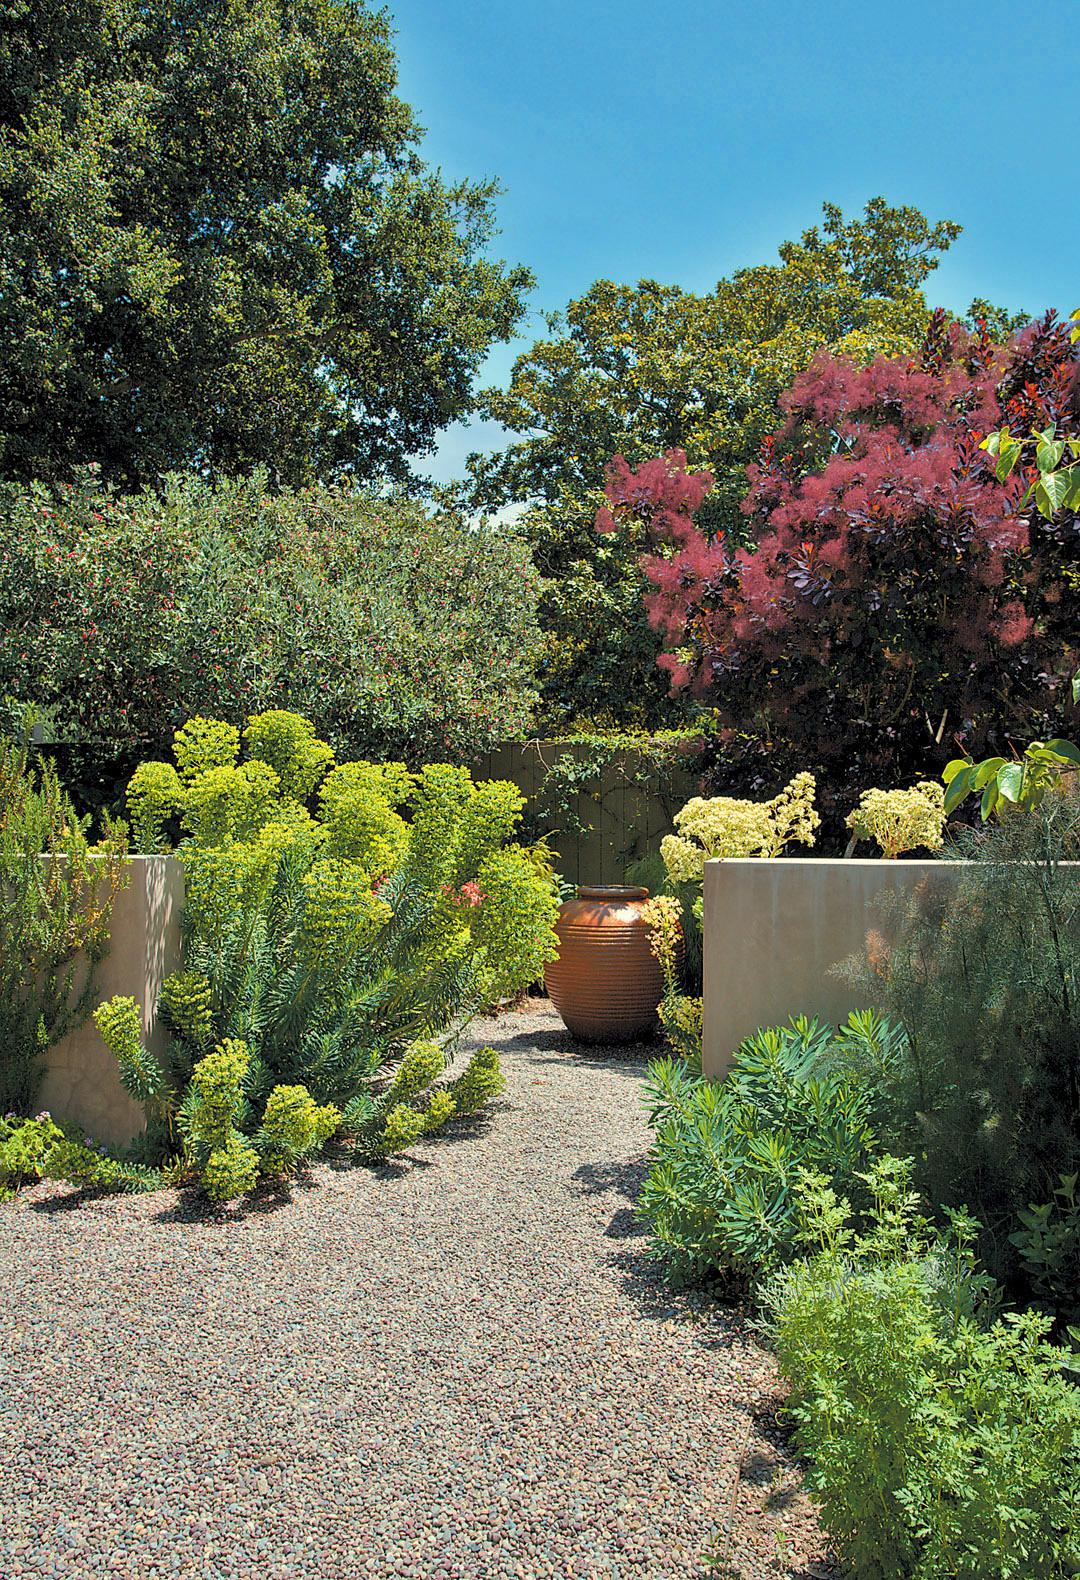 Best Mediterranean Landscape Design Ideas Remodel: Garden Bloggers Fling: Bernard Trainor Garden Preview